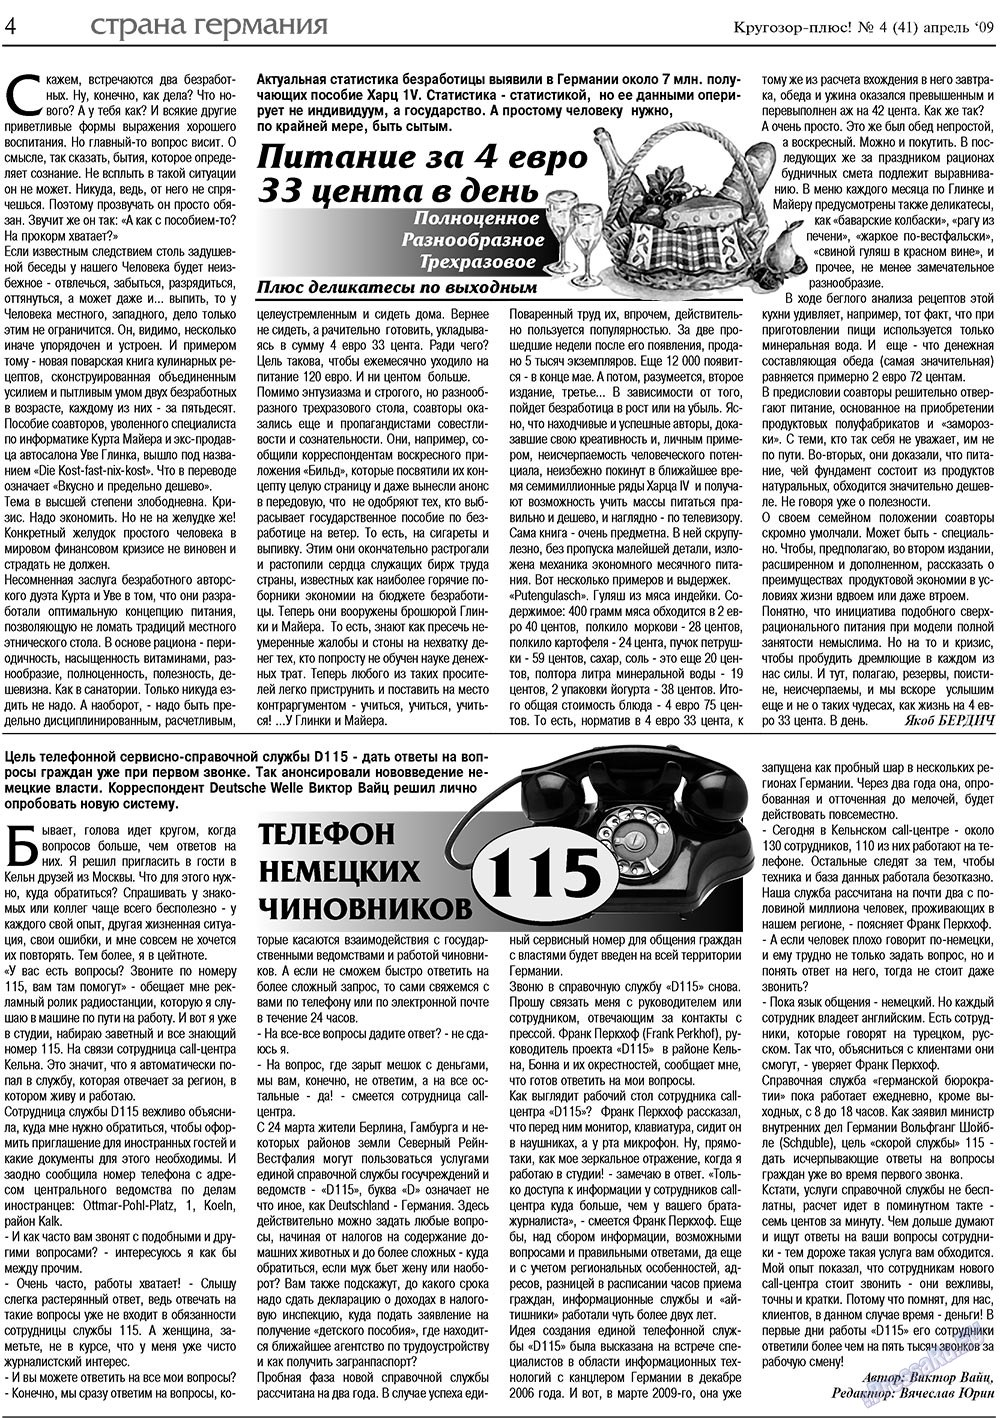 Кругозор плюс! (газета). 2009 год, номер 4, стр. 4